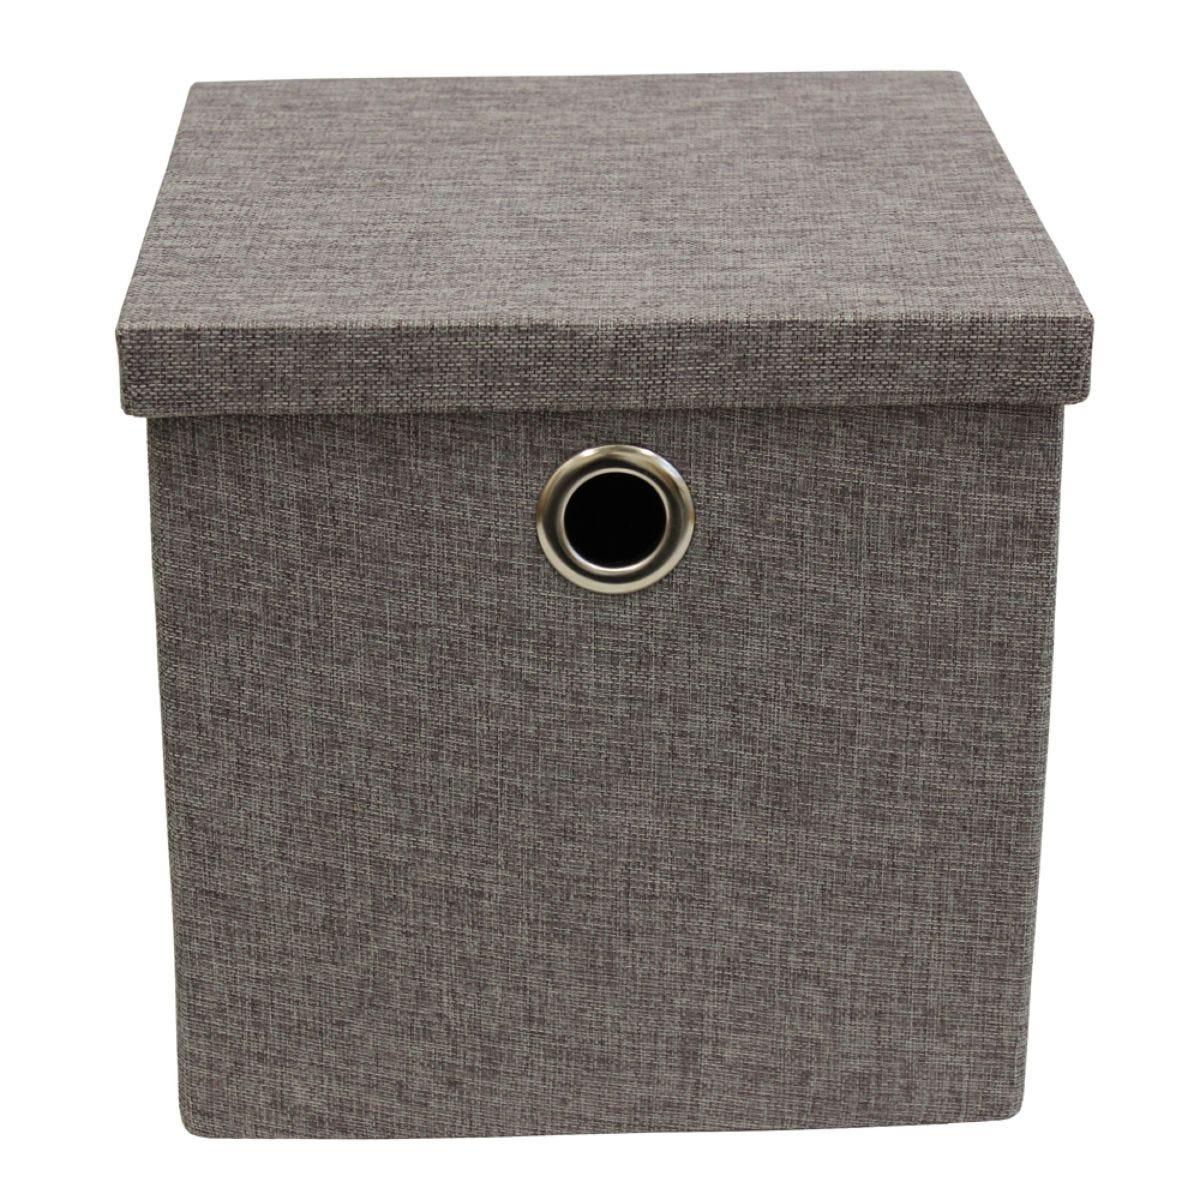 JVL Foldable Storage Box With Chrome Handles - Dark Grey